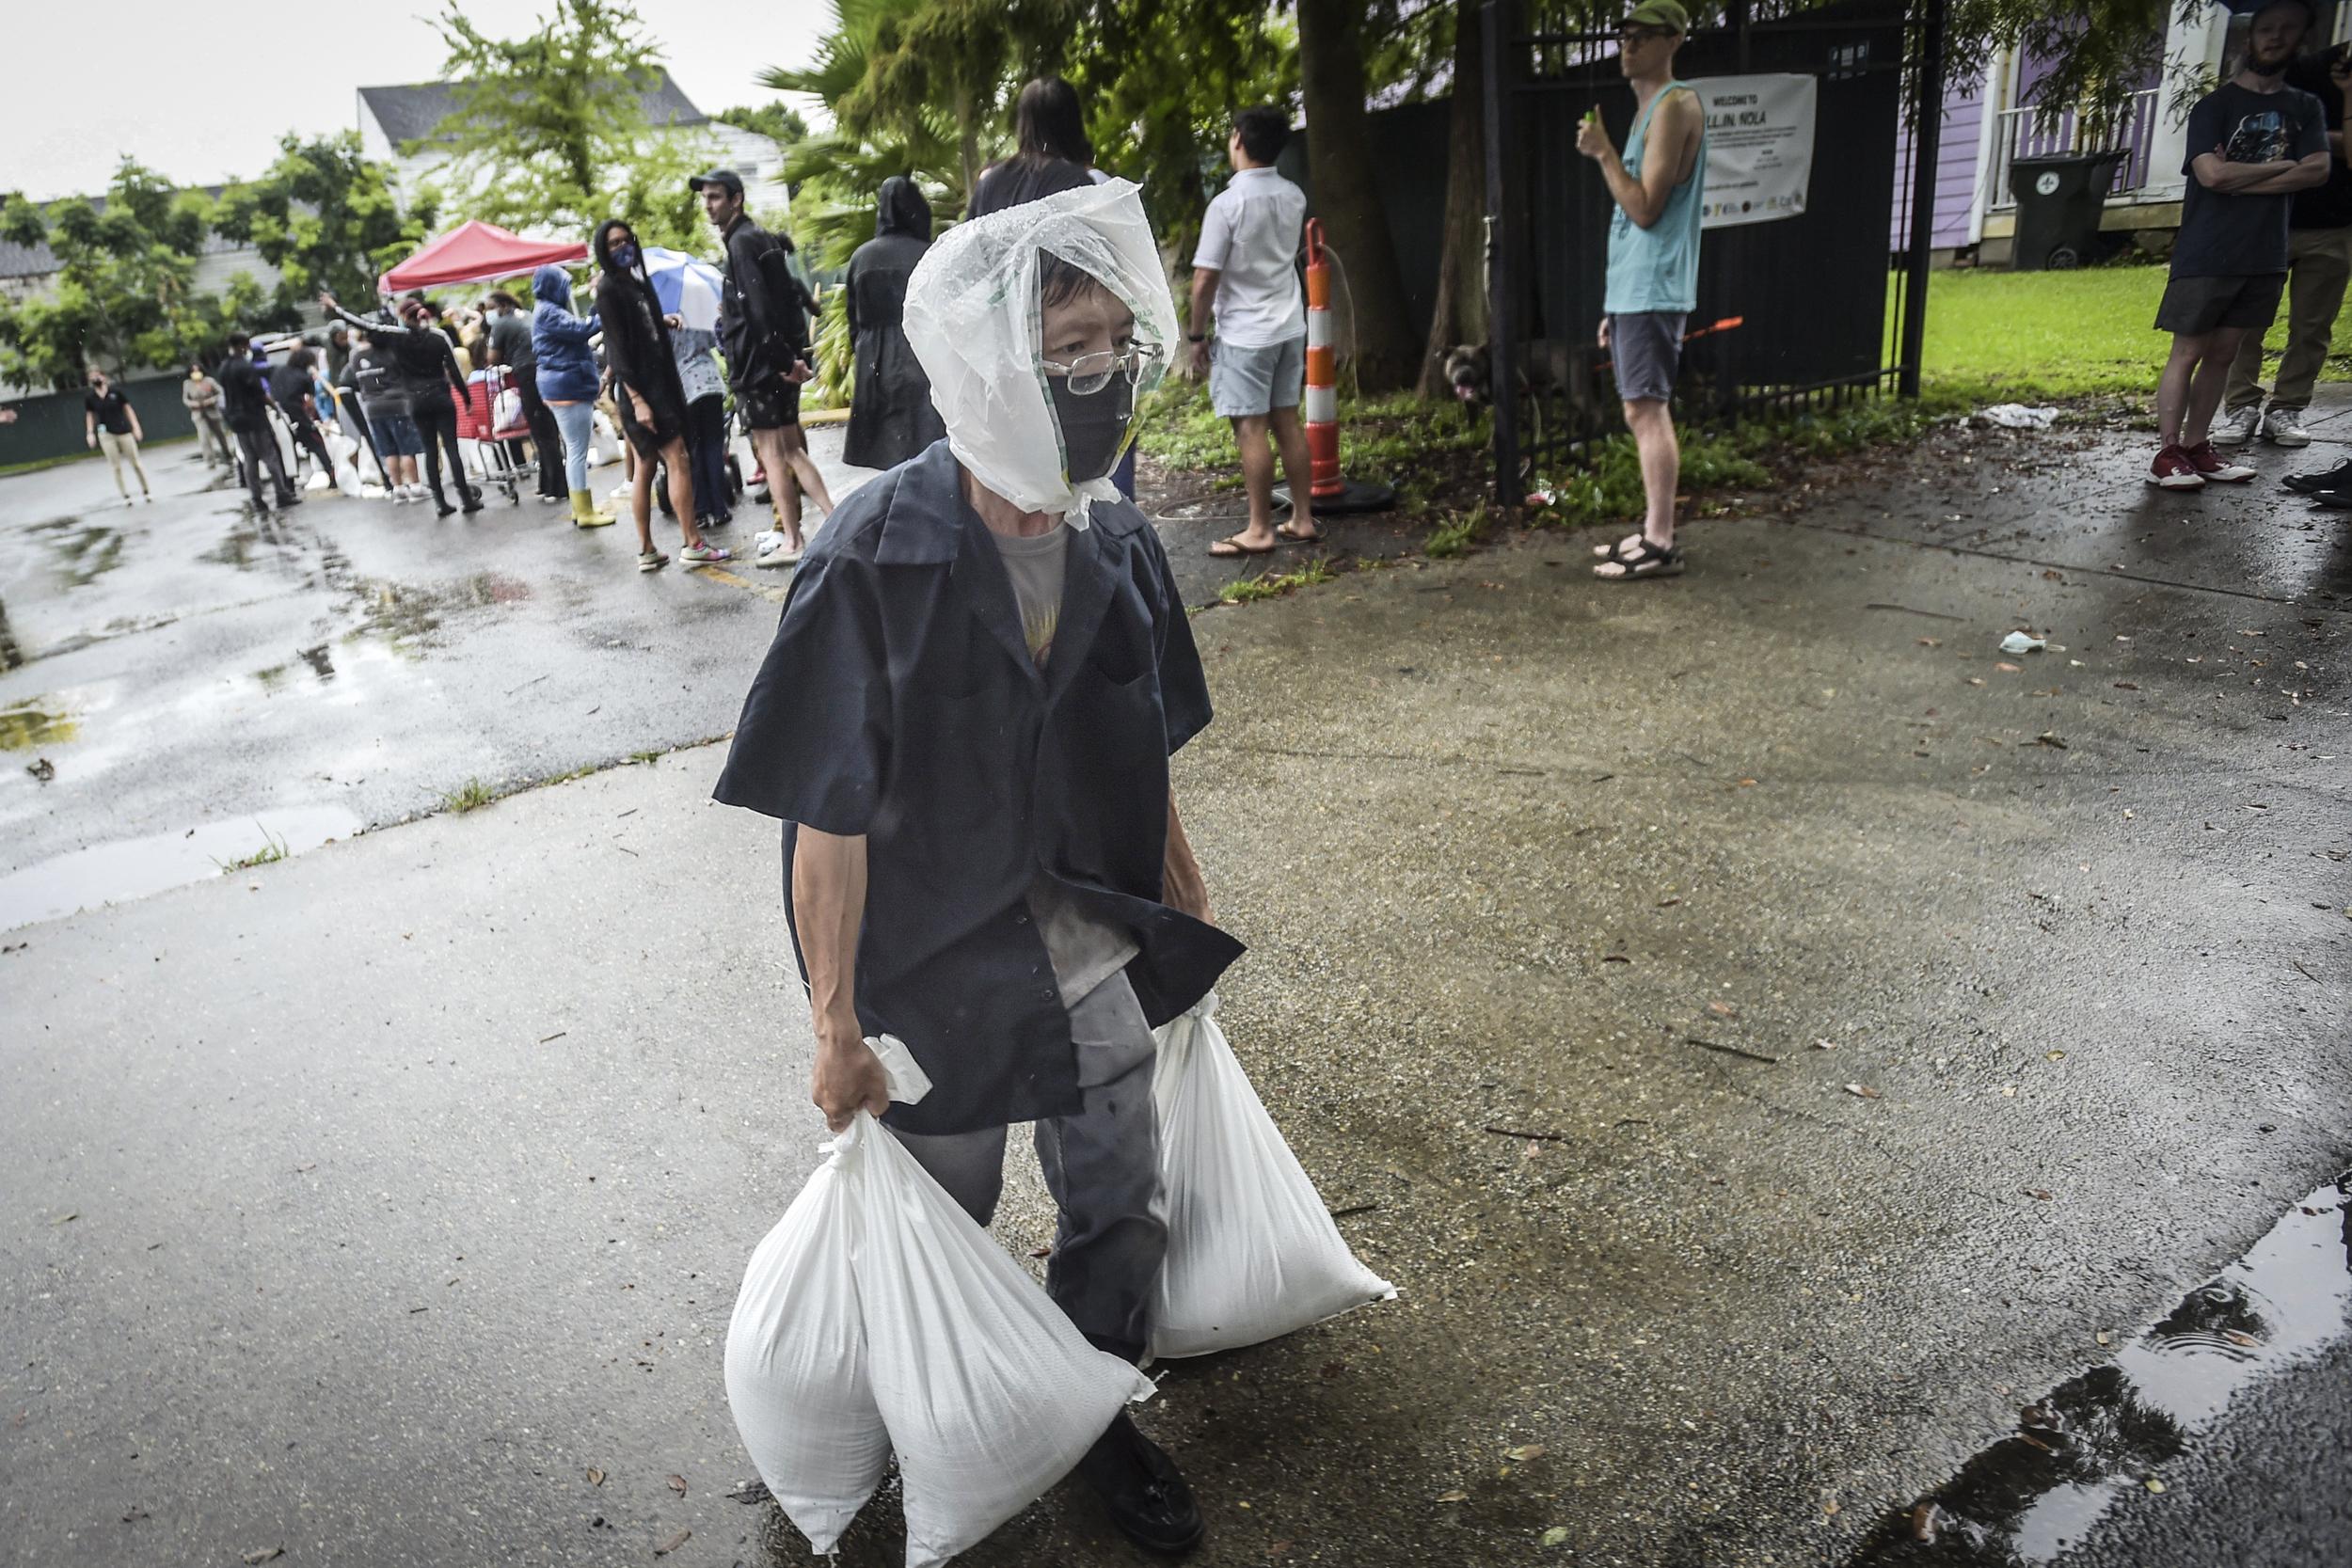 Hurricane Ida on track to slam New Orleans amid severe Covid outbreak